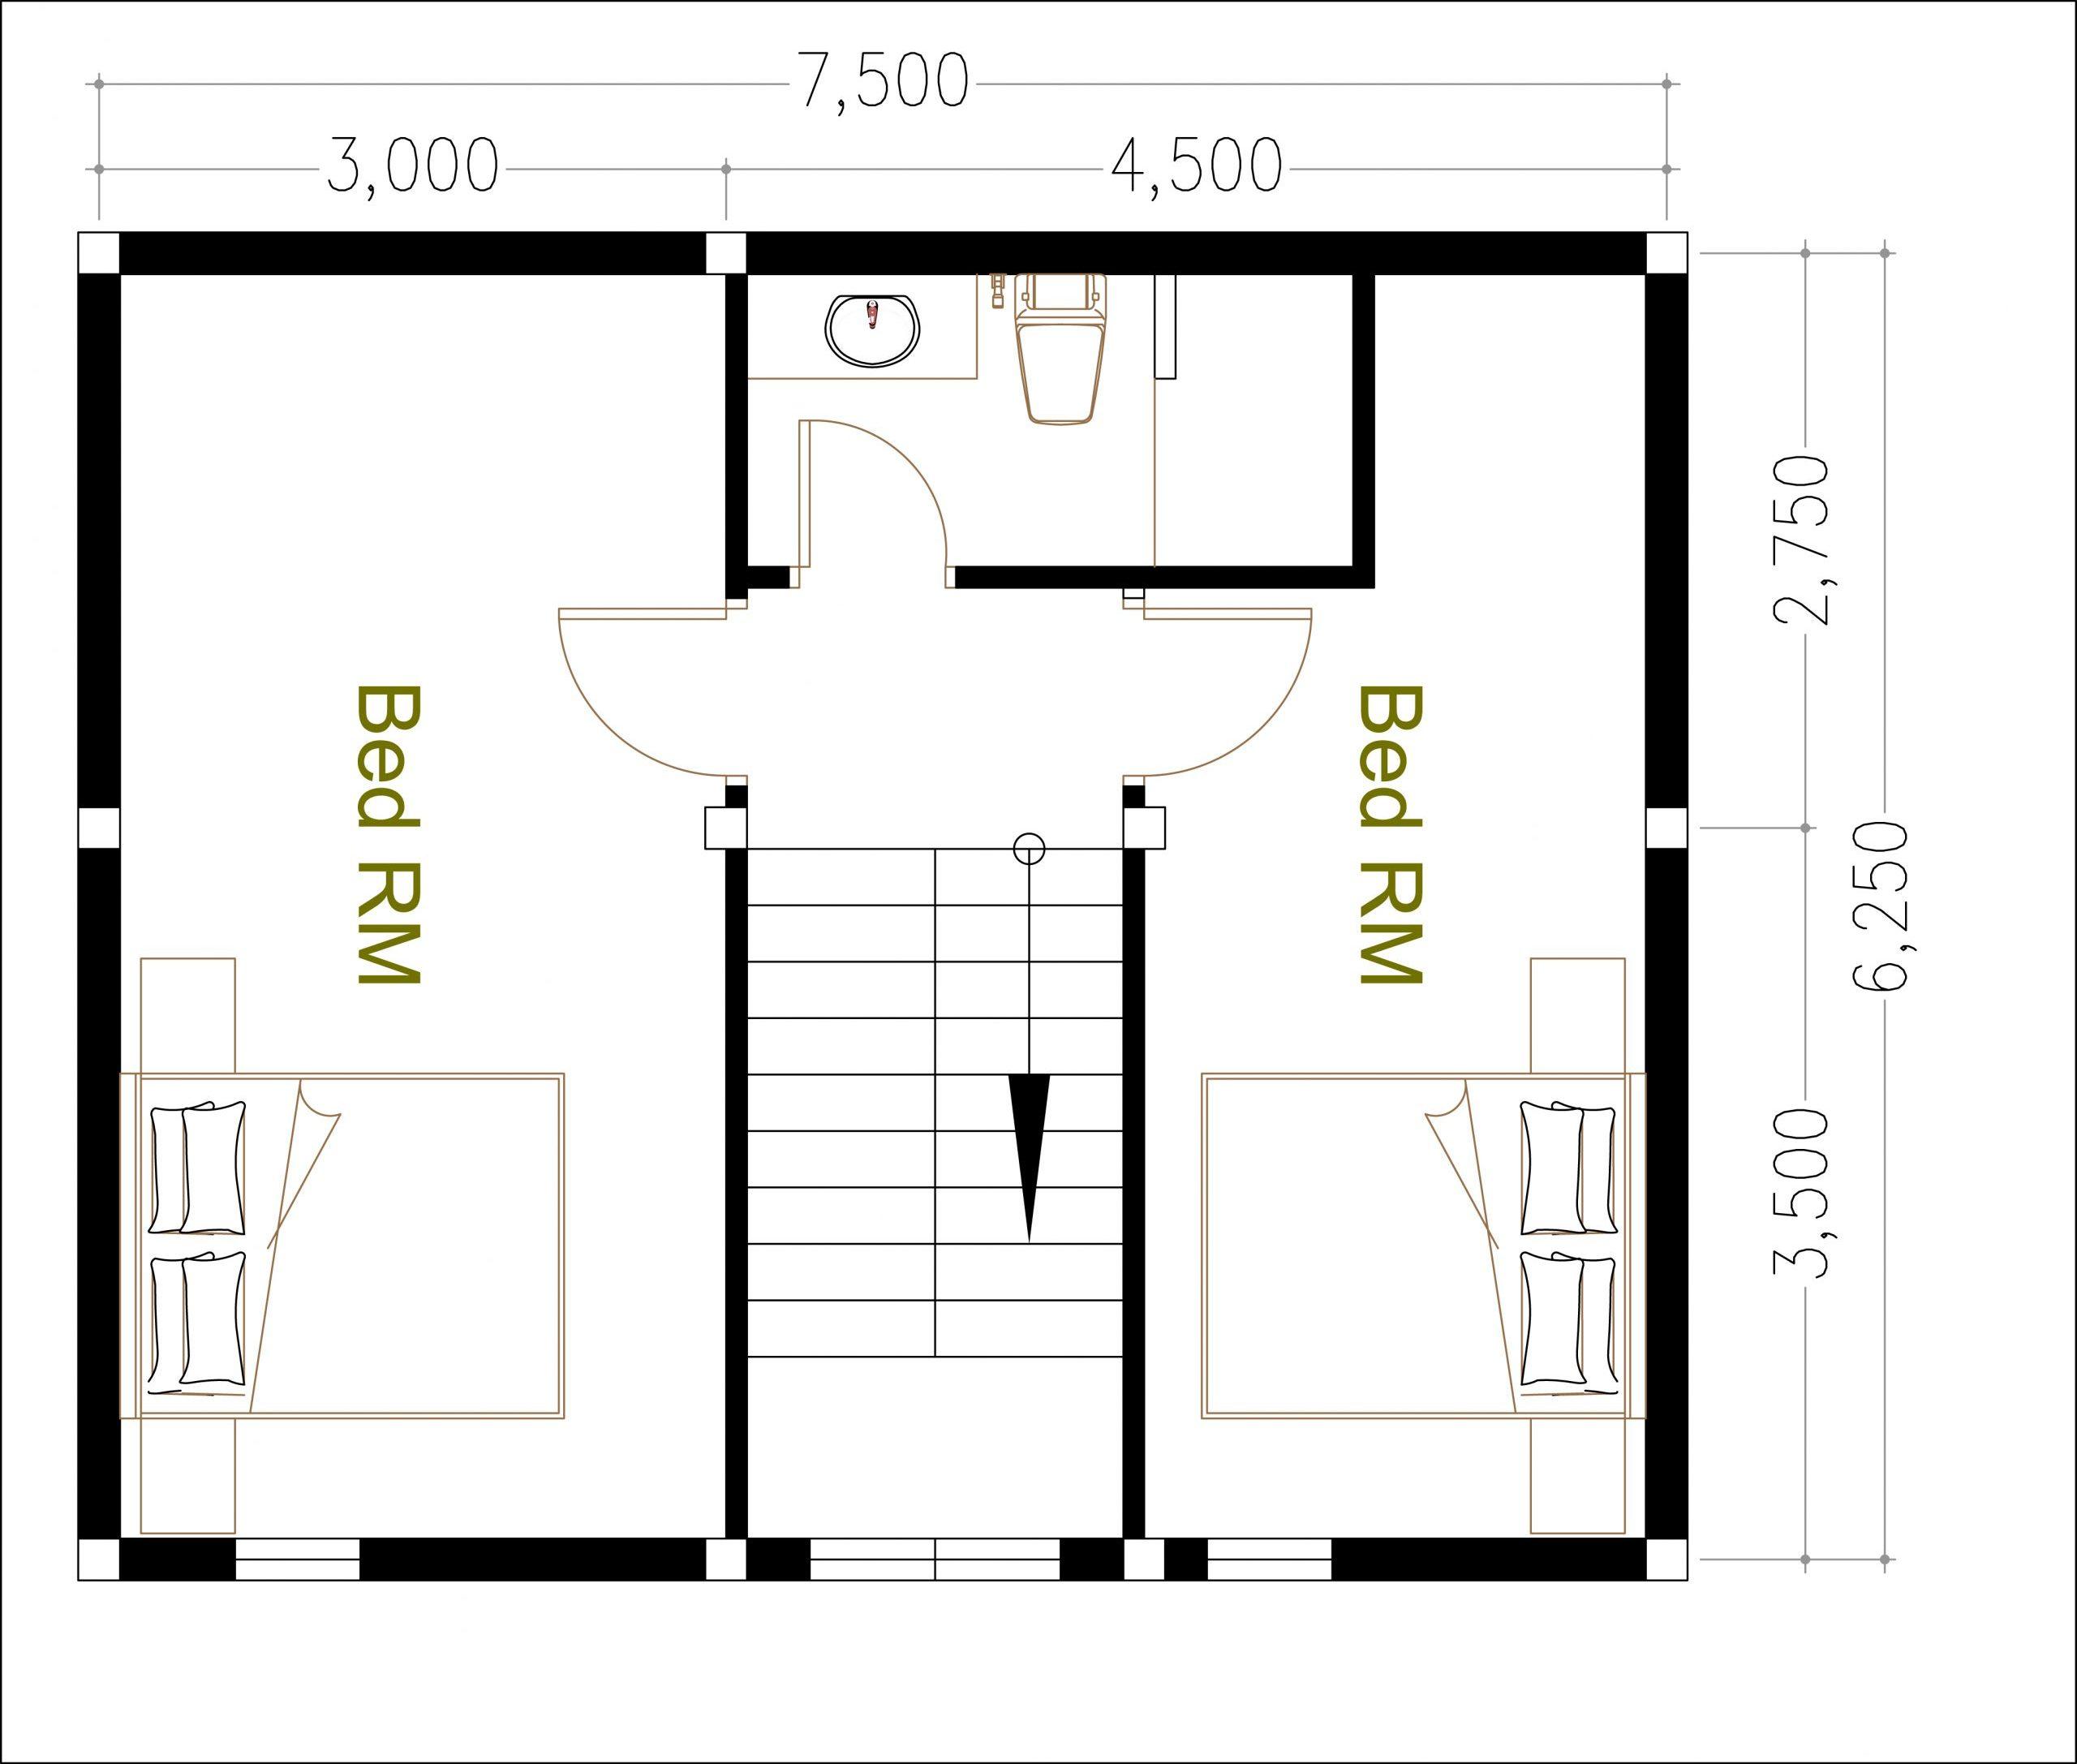 House 0.5 floor plan